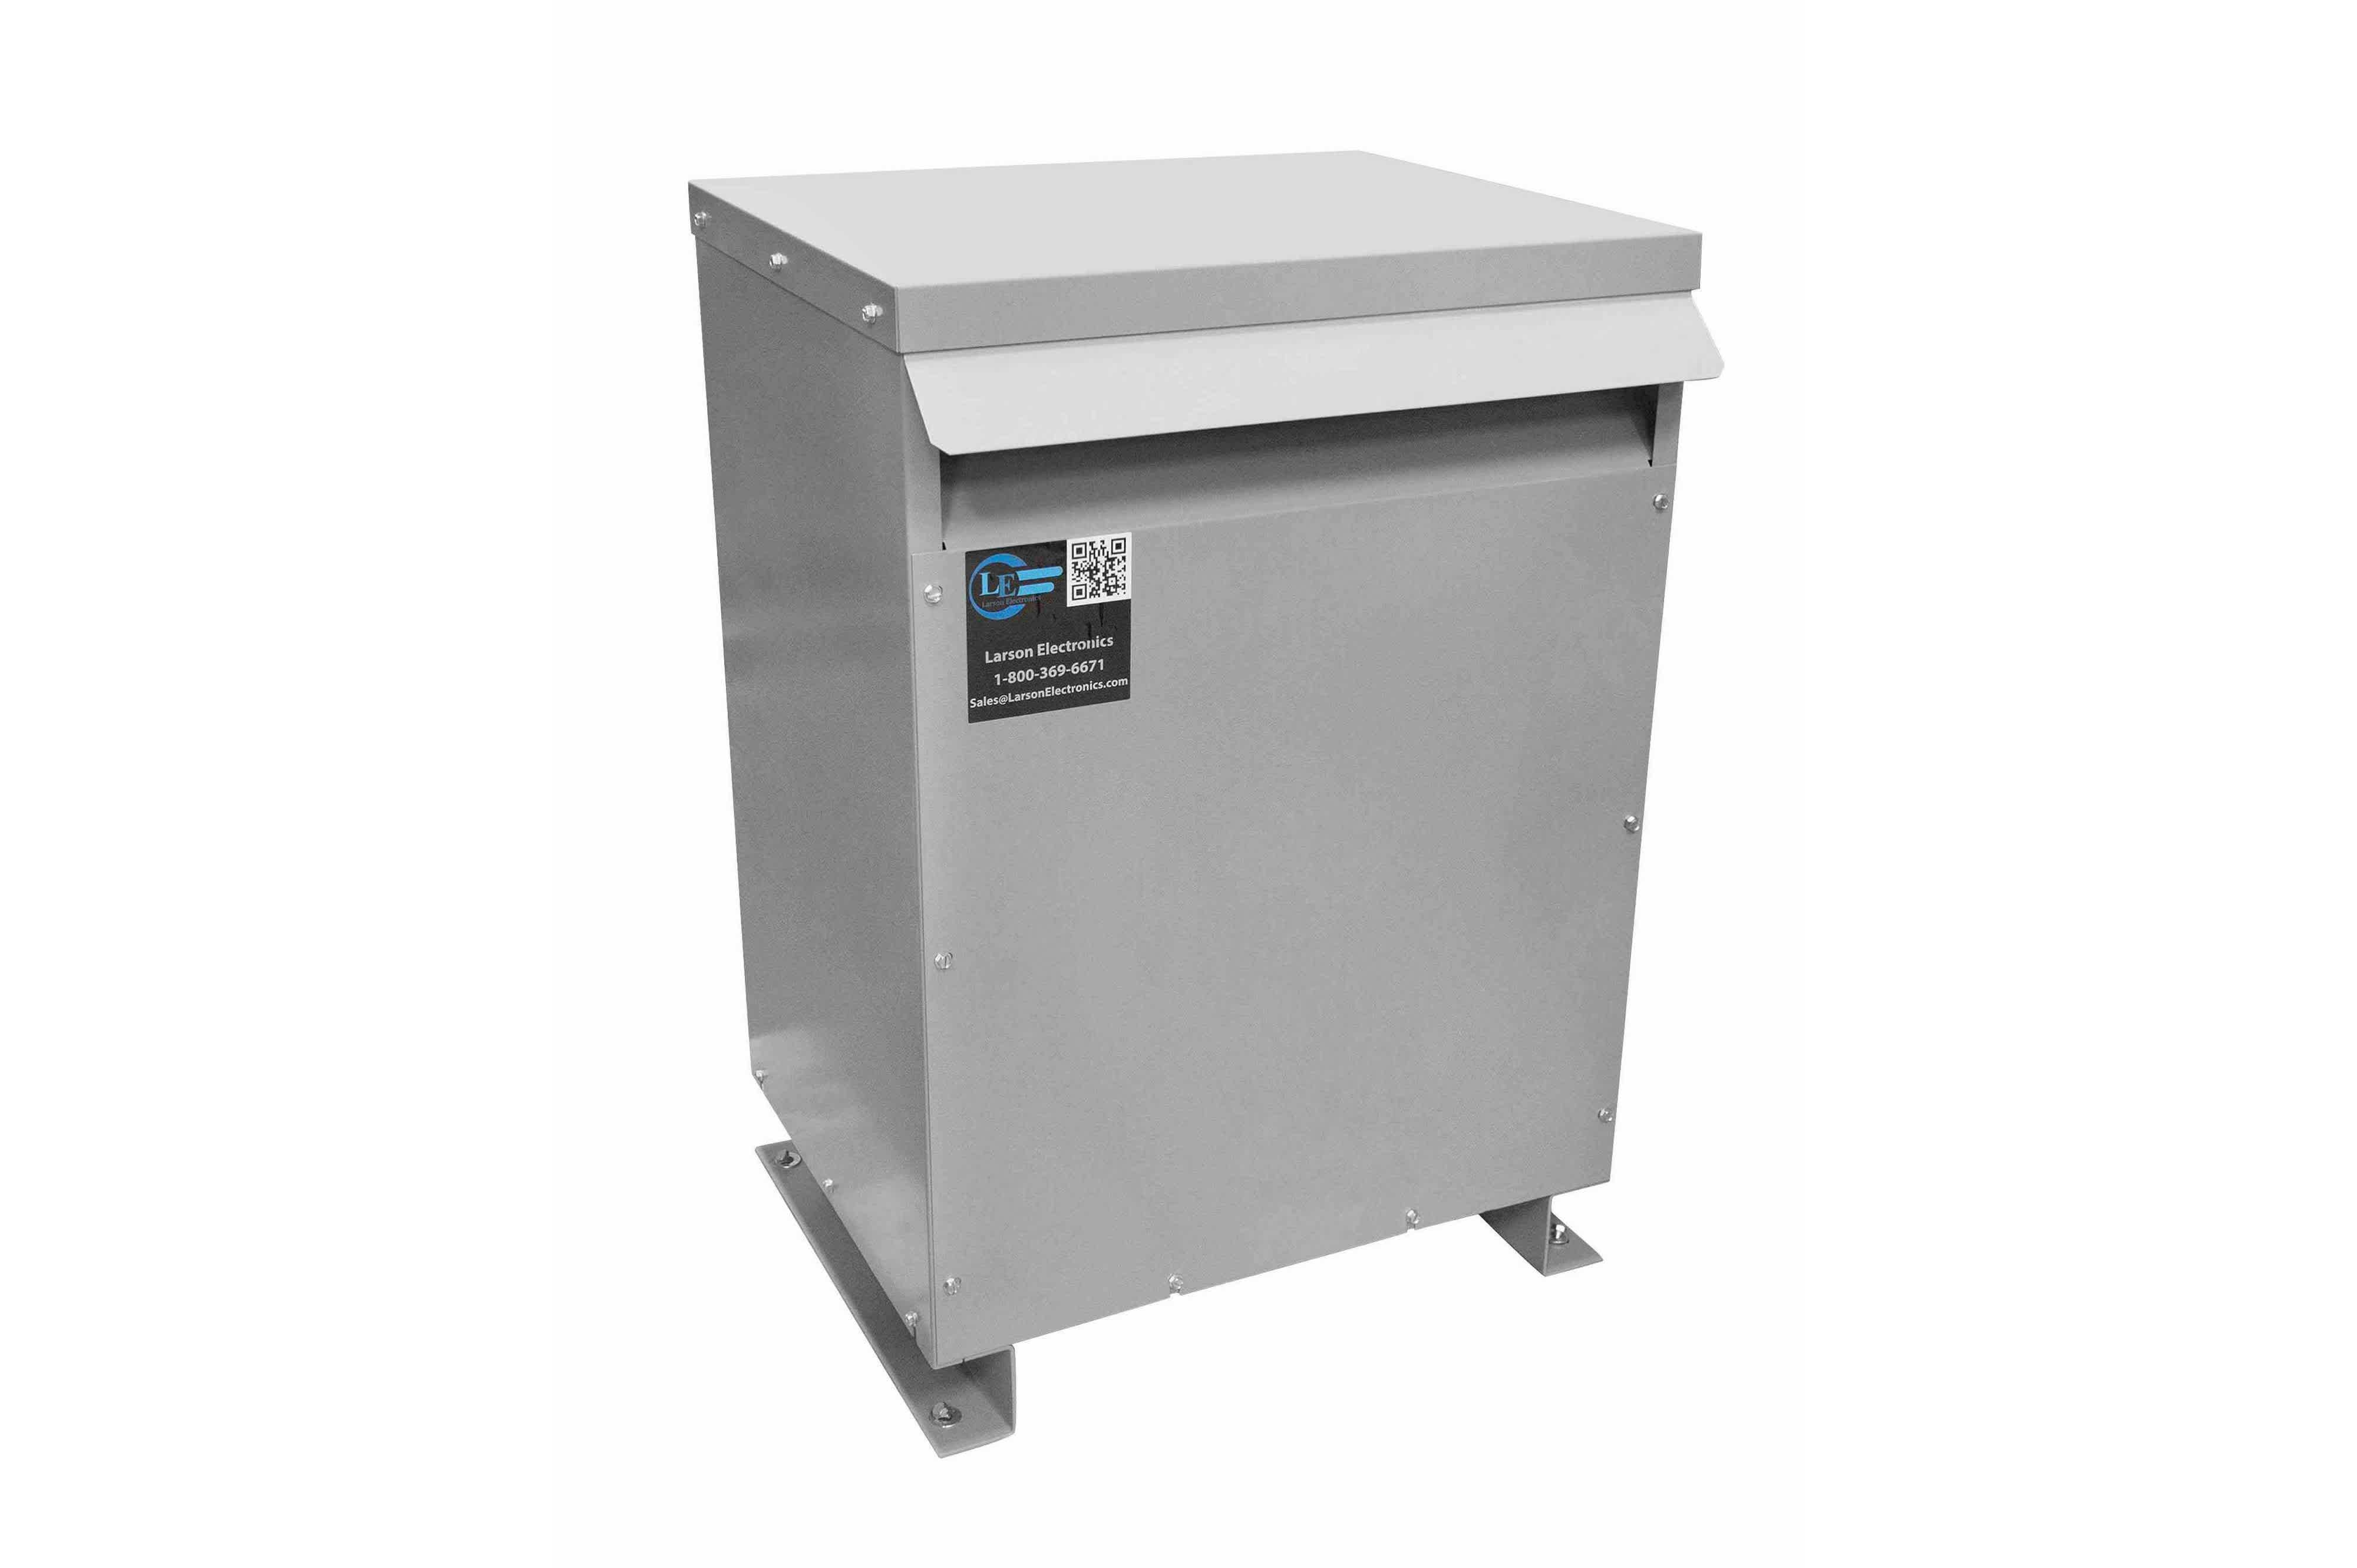 36 kVA 3PH DOE Transformer, 460V Delta Primary, 208Y/120 Wye-N Secondary, N3R, Ventilated, 60 Hz